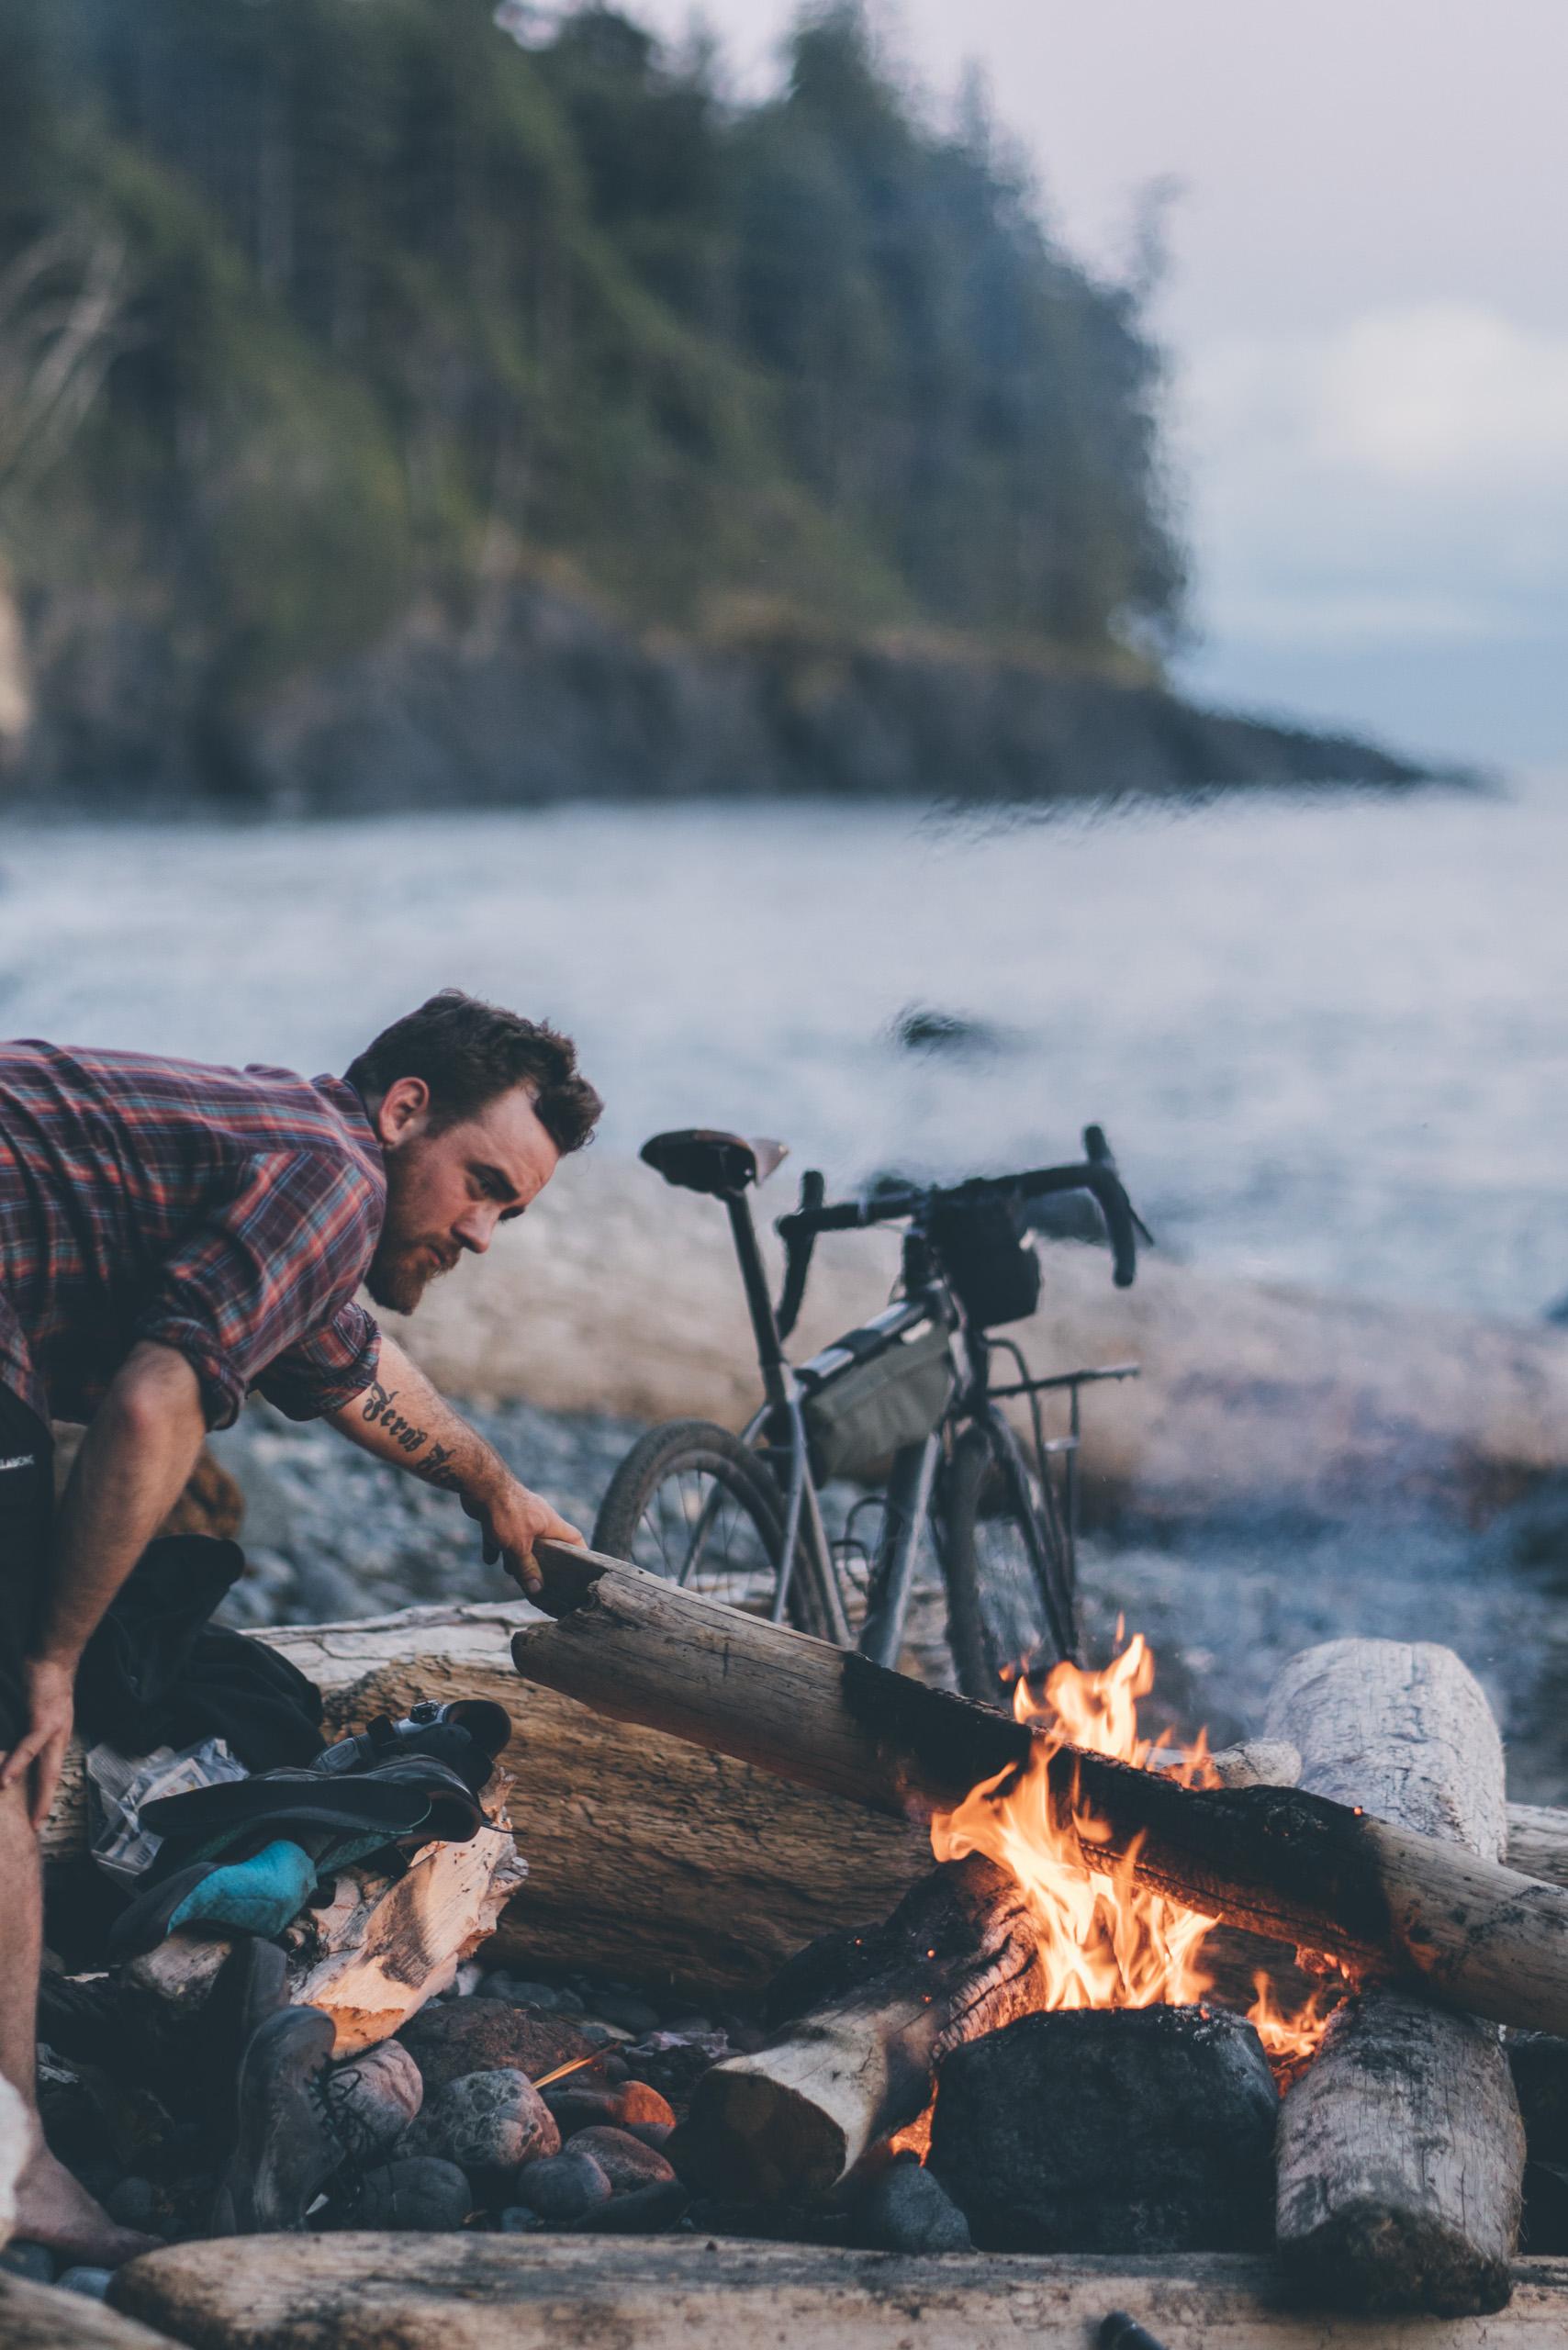 Bikepacking-VanIsland-JohnsonStudios-201806-221.jpg